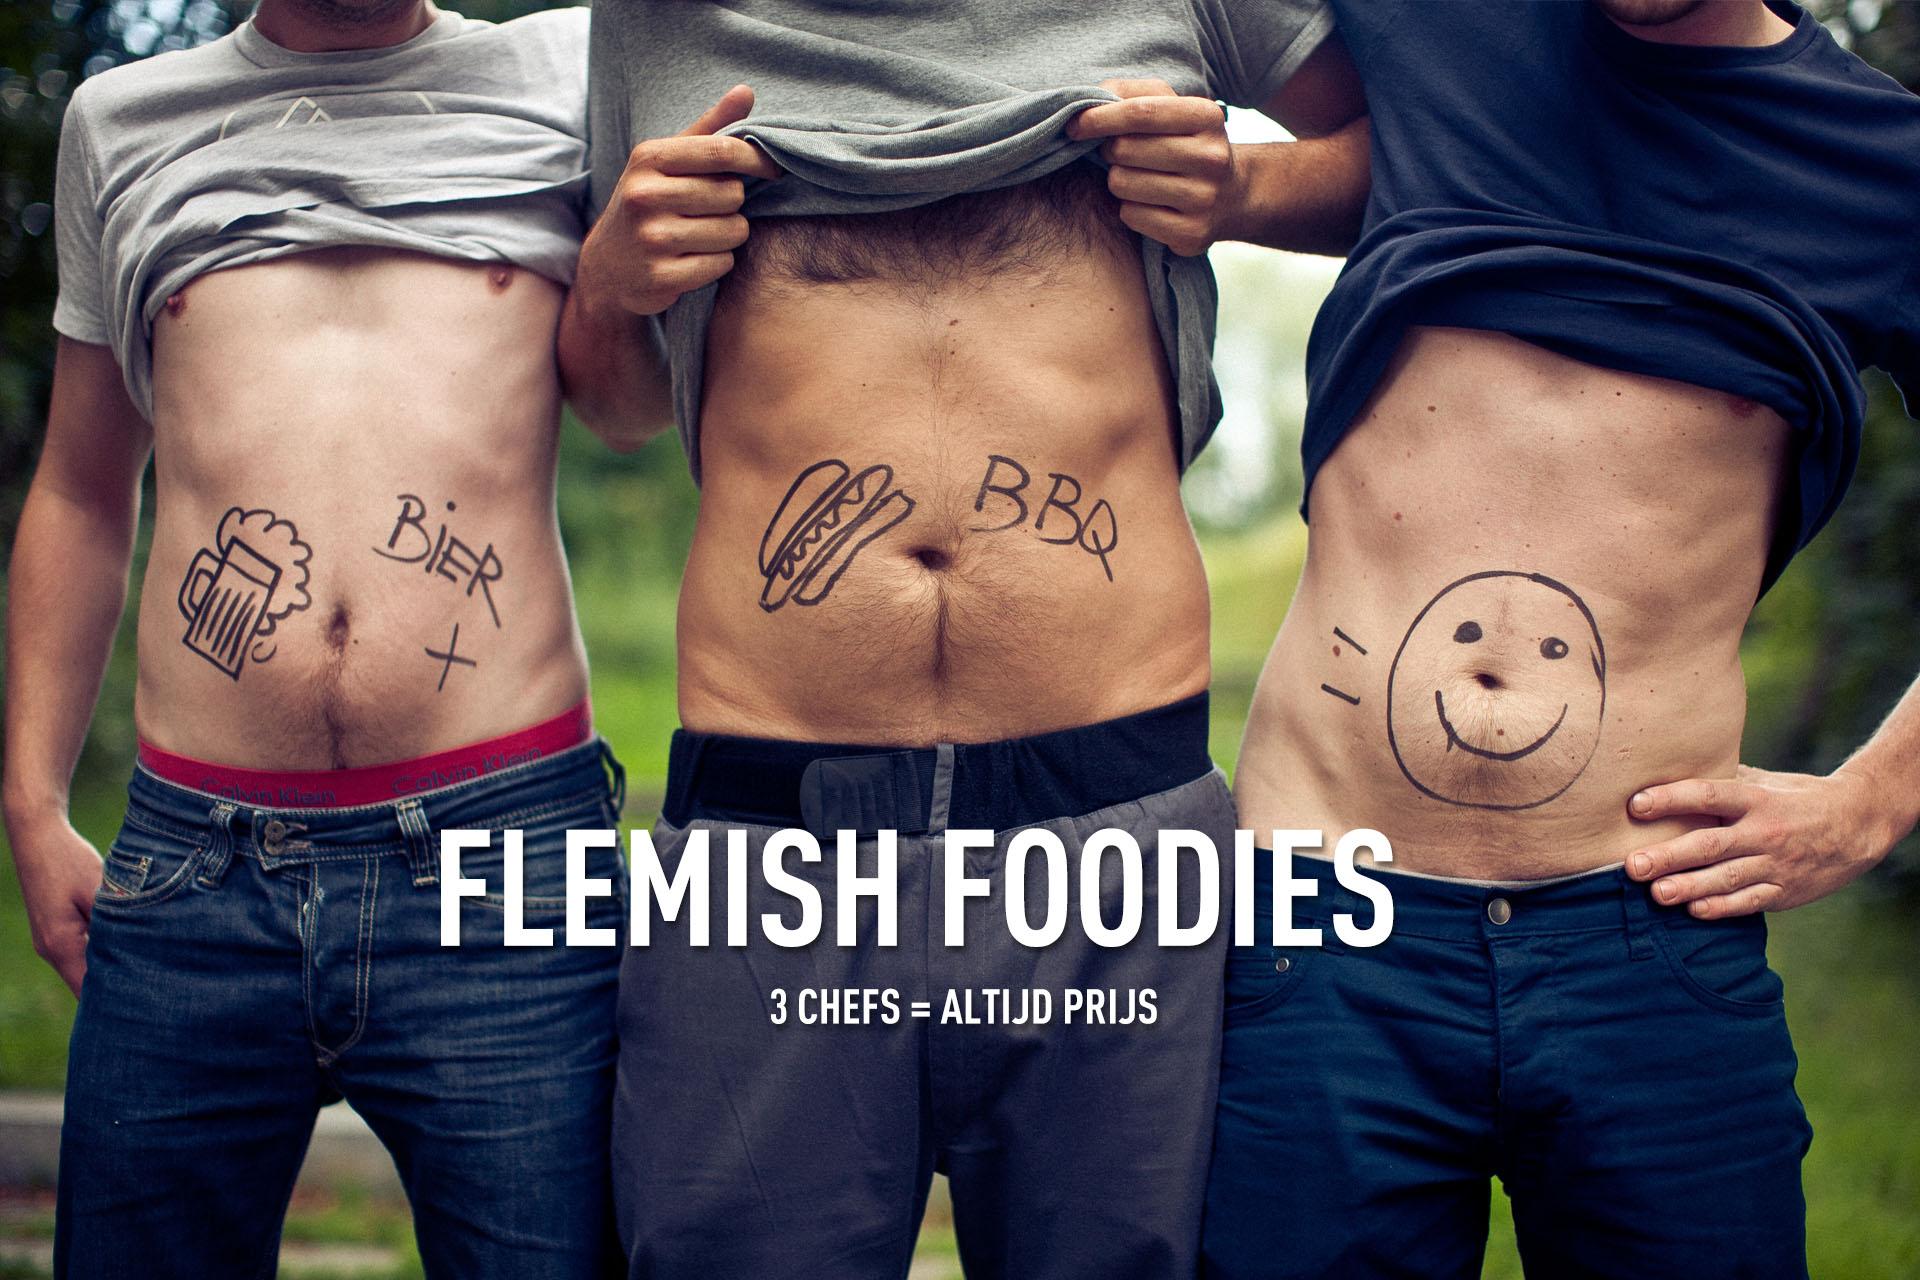 FLEMISH FOODIES FFEST.jpg